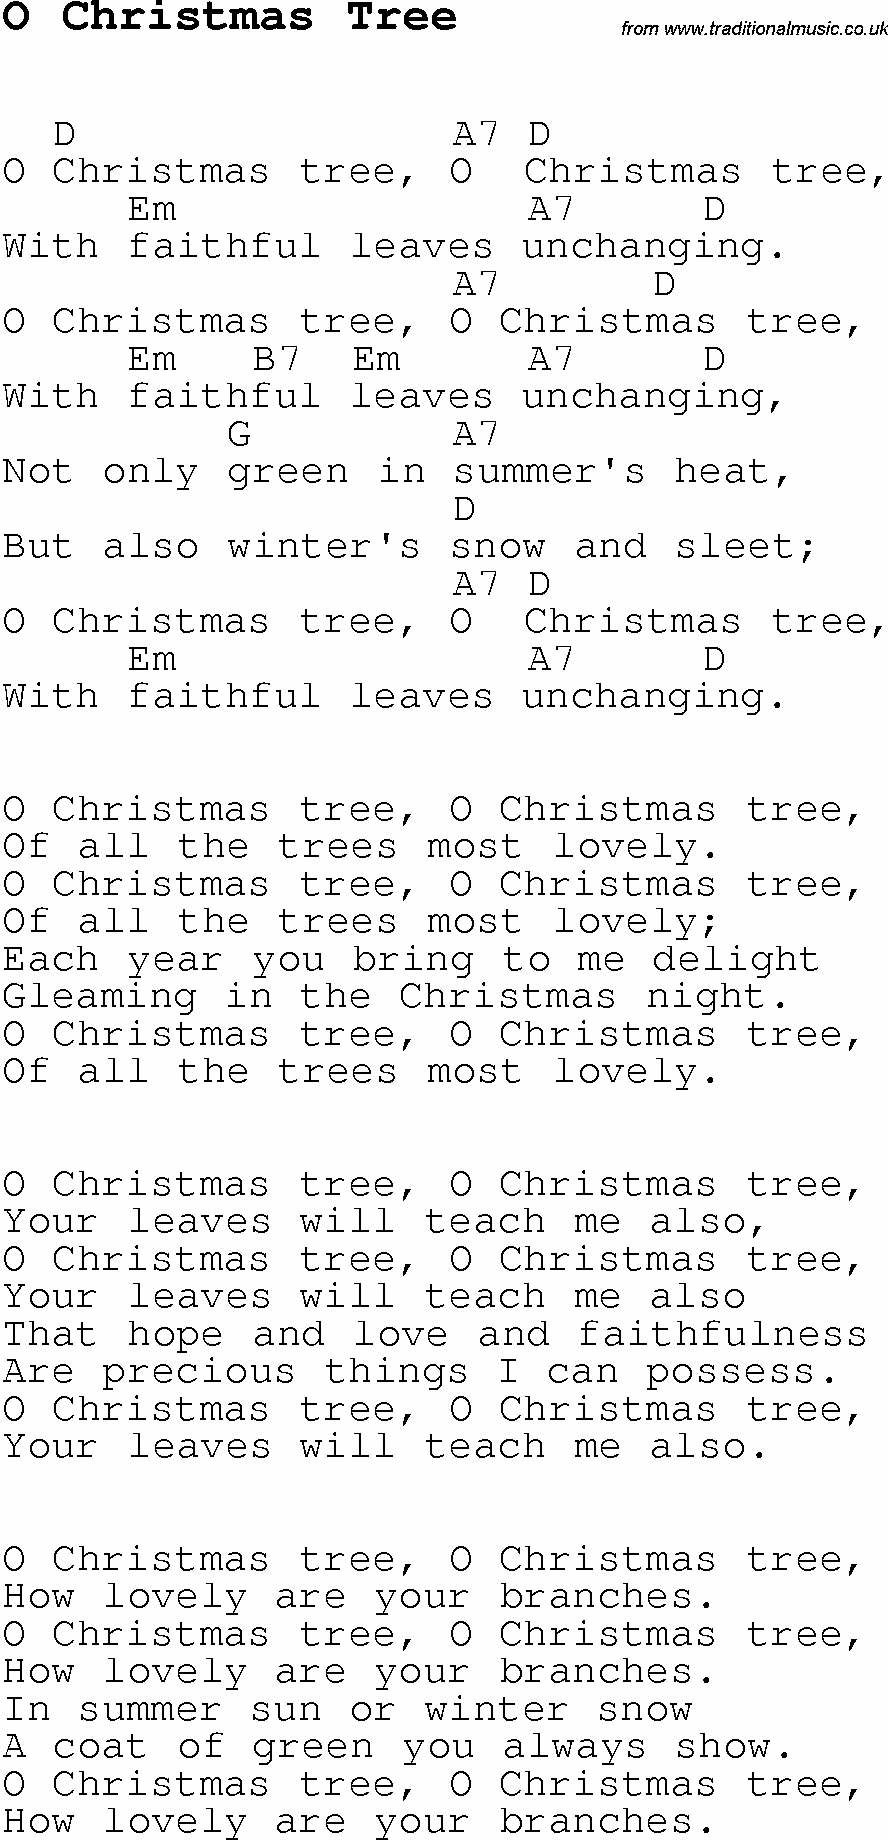 Christmas Songs And Carols Lyrics With Chords For Guitar Banjo For O Christmas Tree Pianoforbe Guitar Chords For Songs Ukulele Lesson Christmas Ukulele Songs